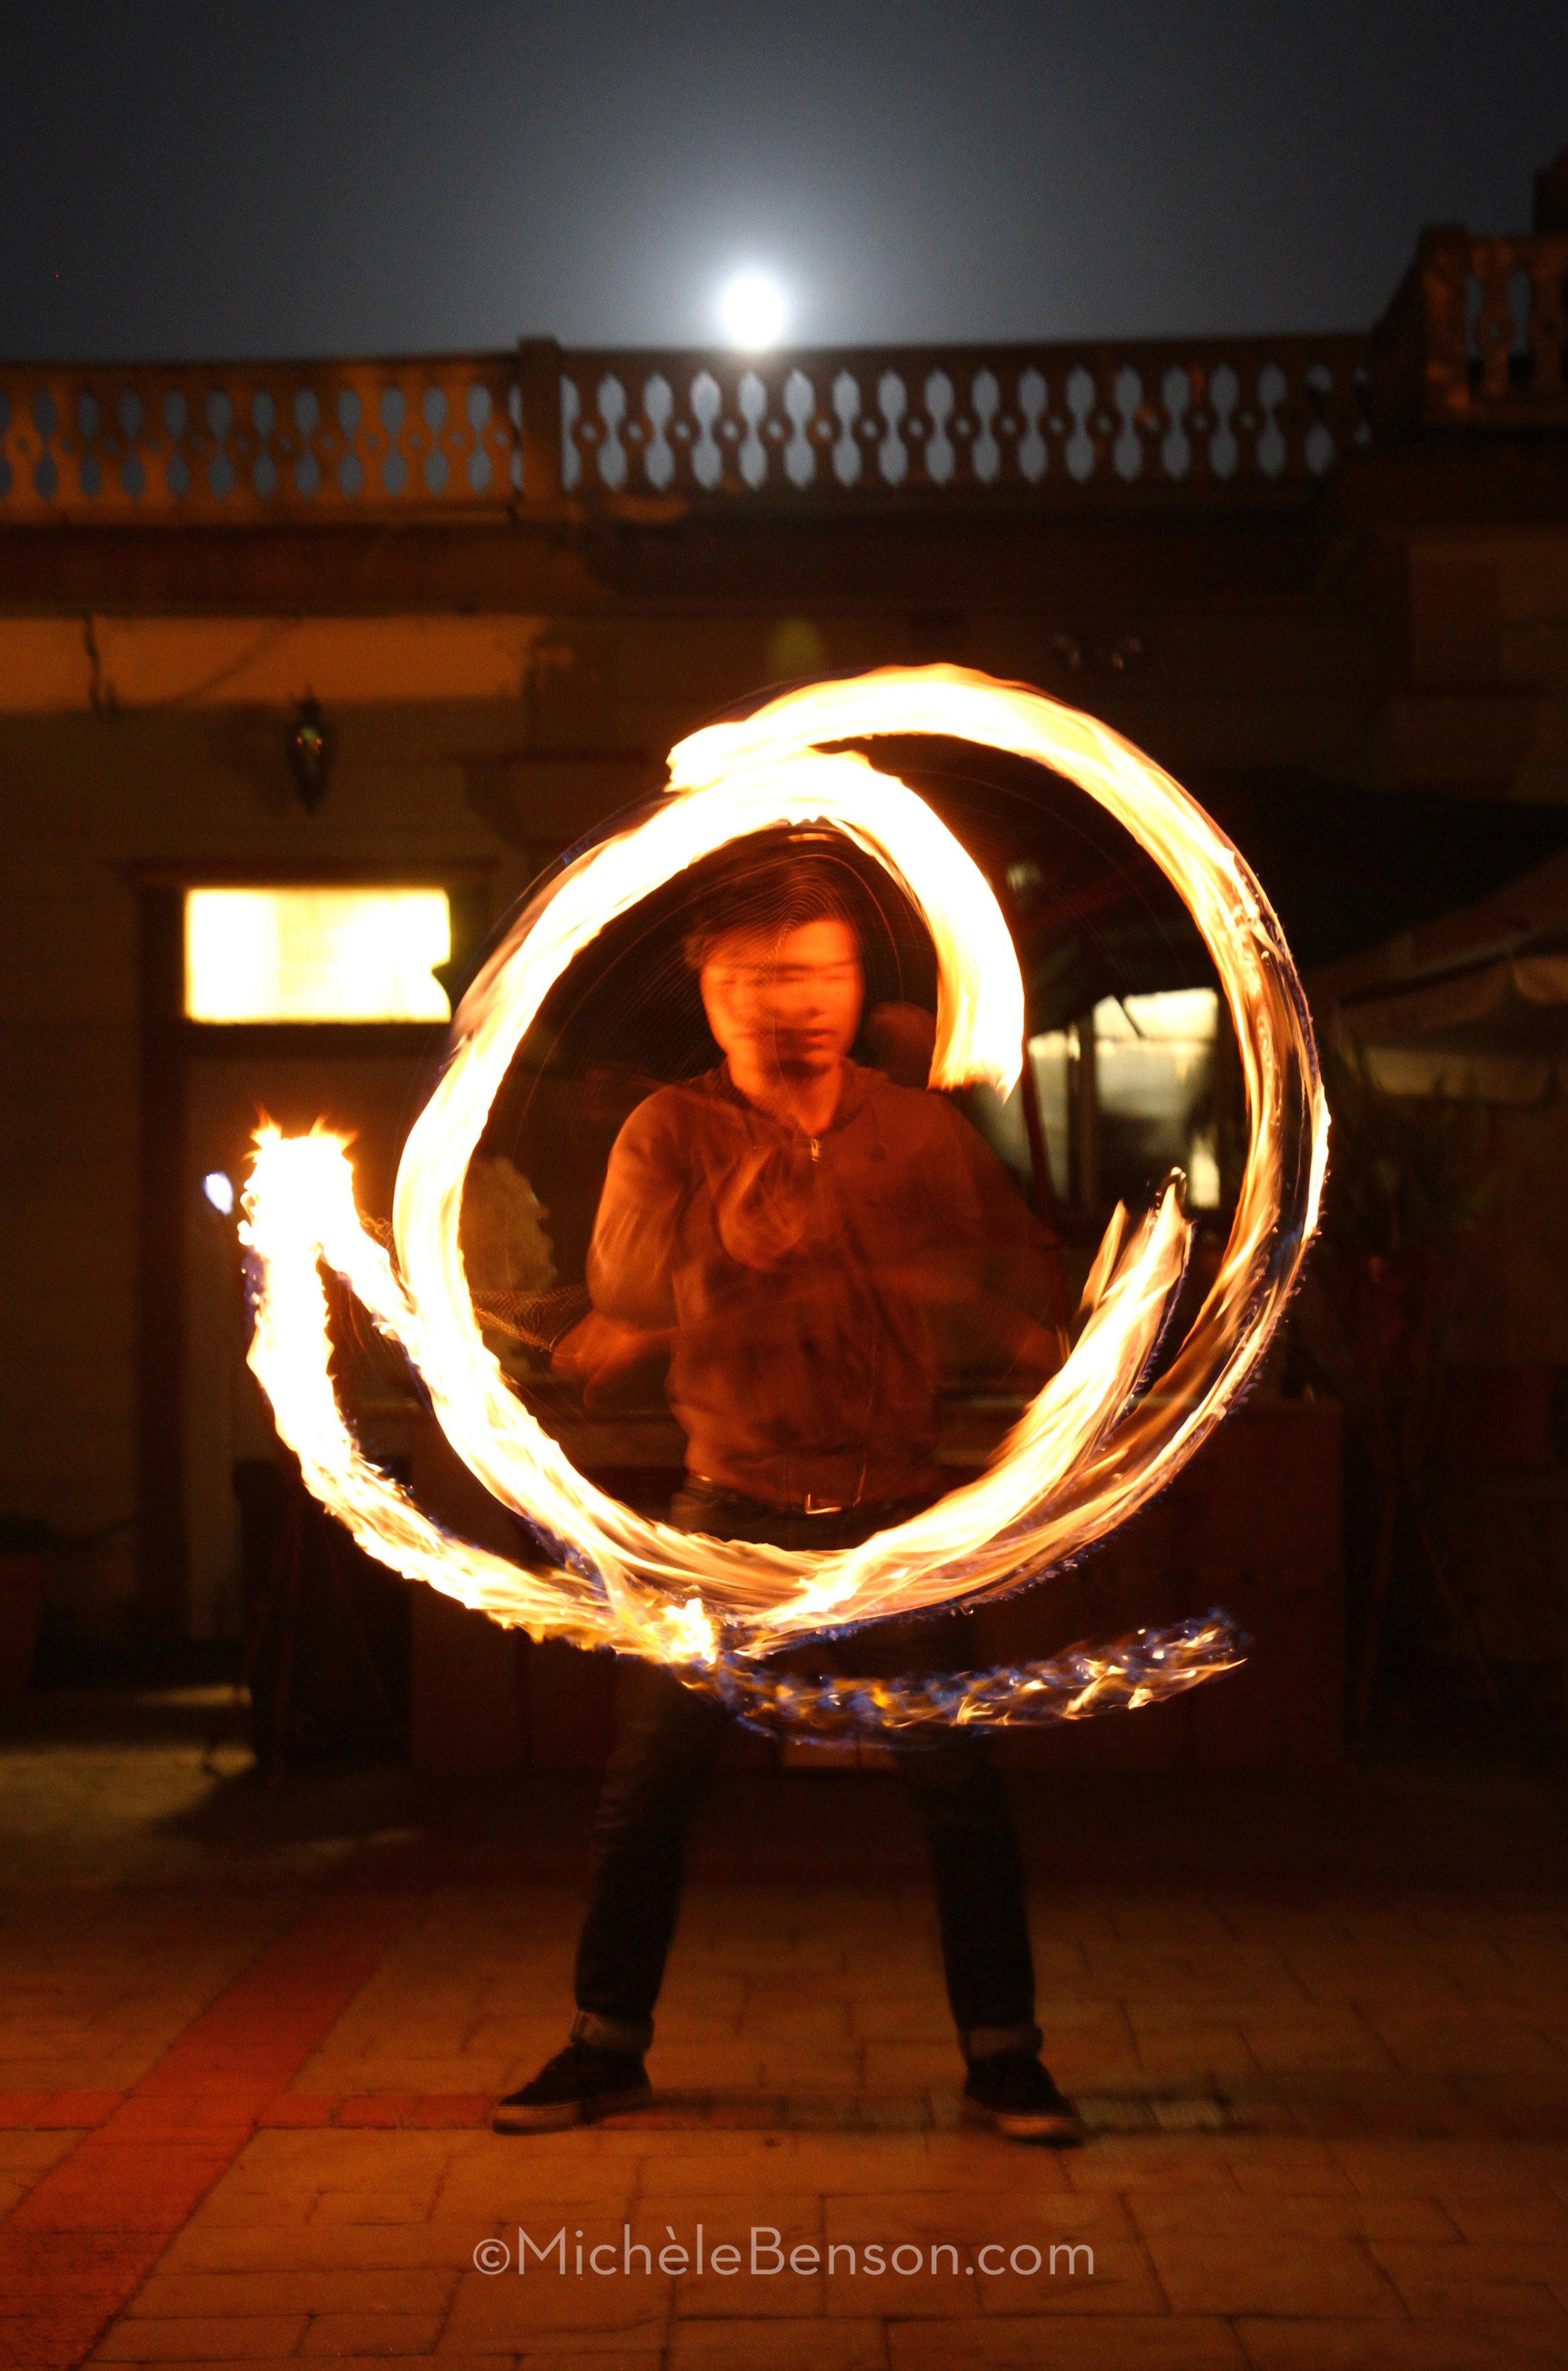 Fire The Alchemy of Balance